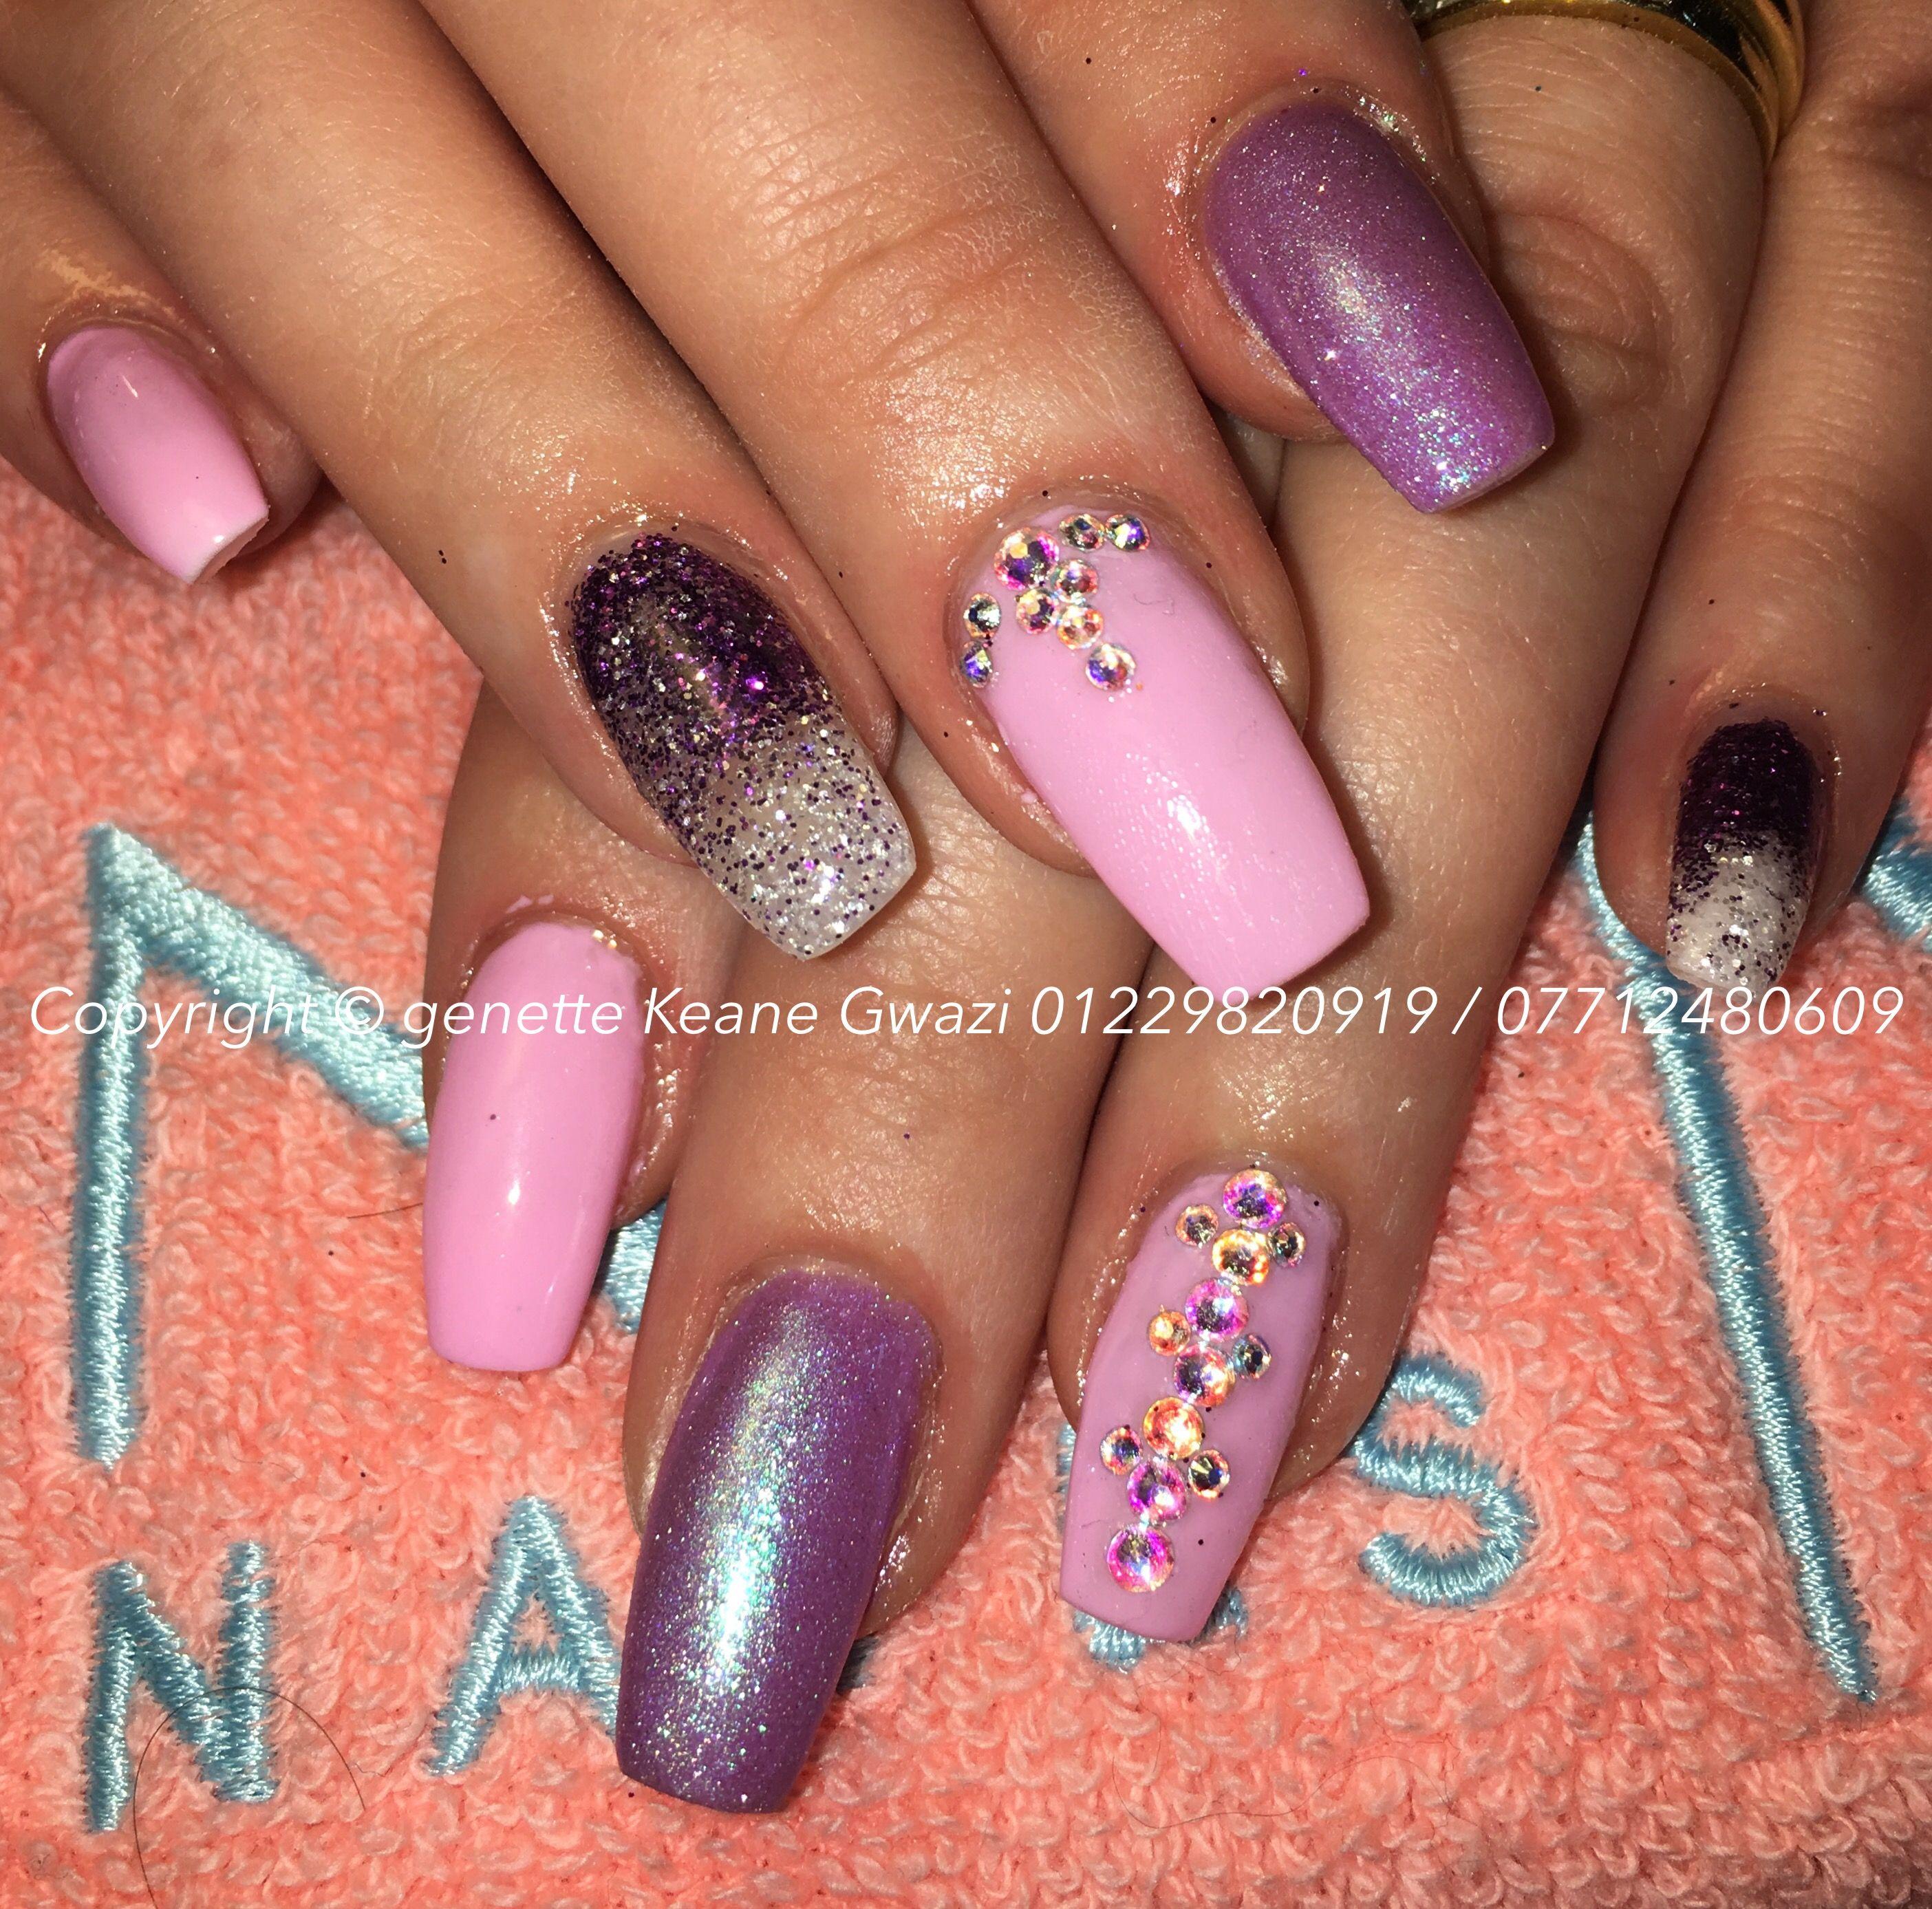 Ombre glitter nail art, purple & pink gel polish with Swarovski nail art